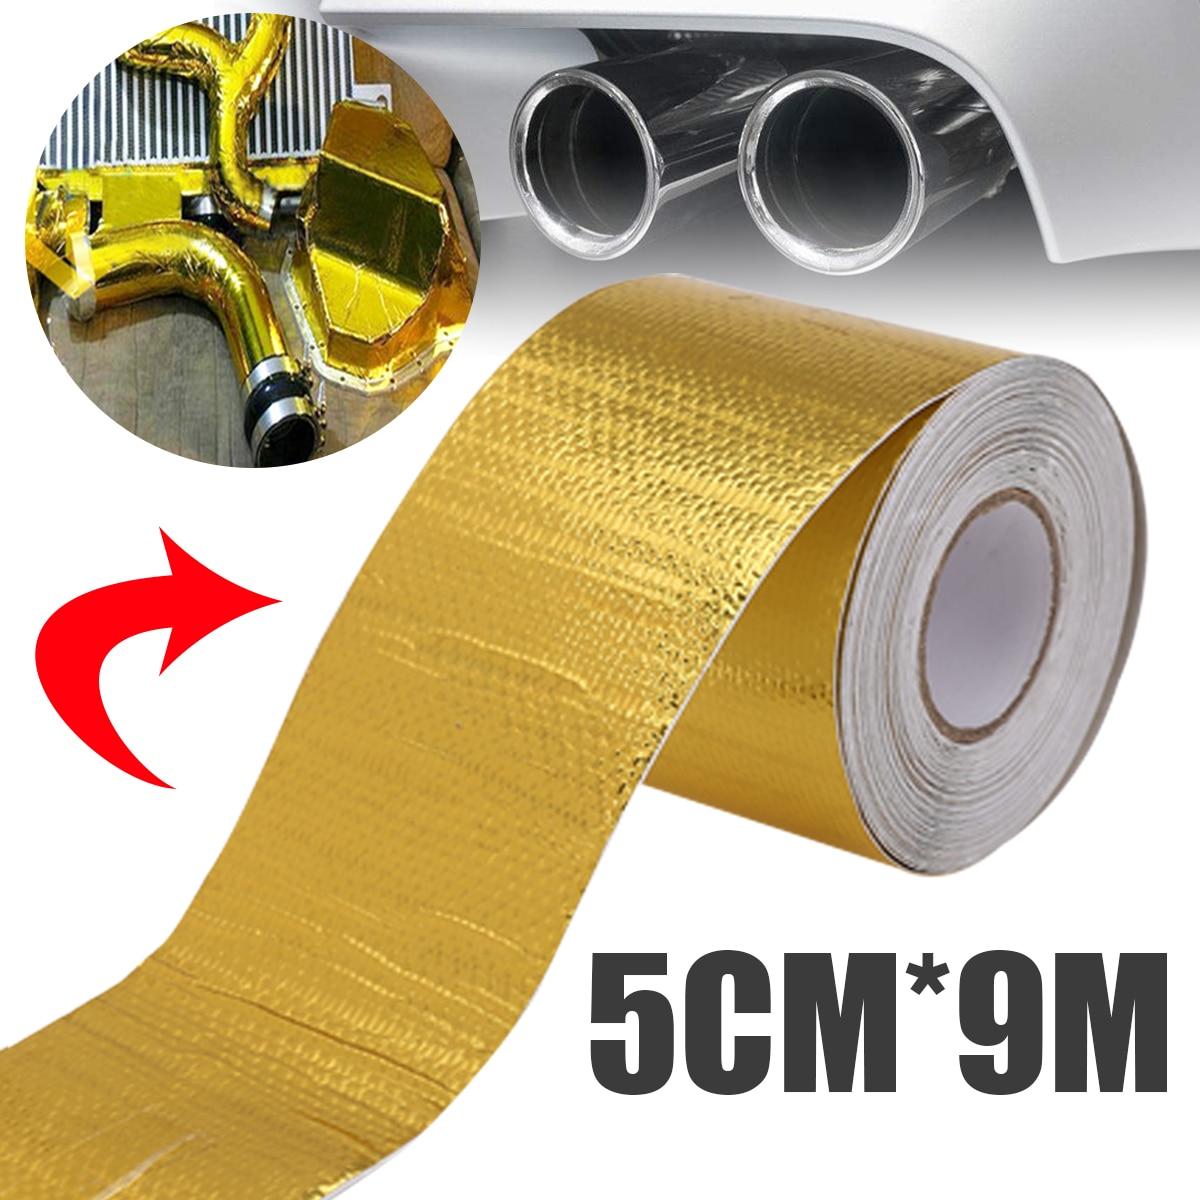 Treyues 1 Roll 5CM*9M Waterproof Fiberglass Adhesive Reflective High Temperature Heat Shield Wrap Tape Gold